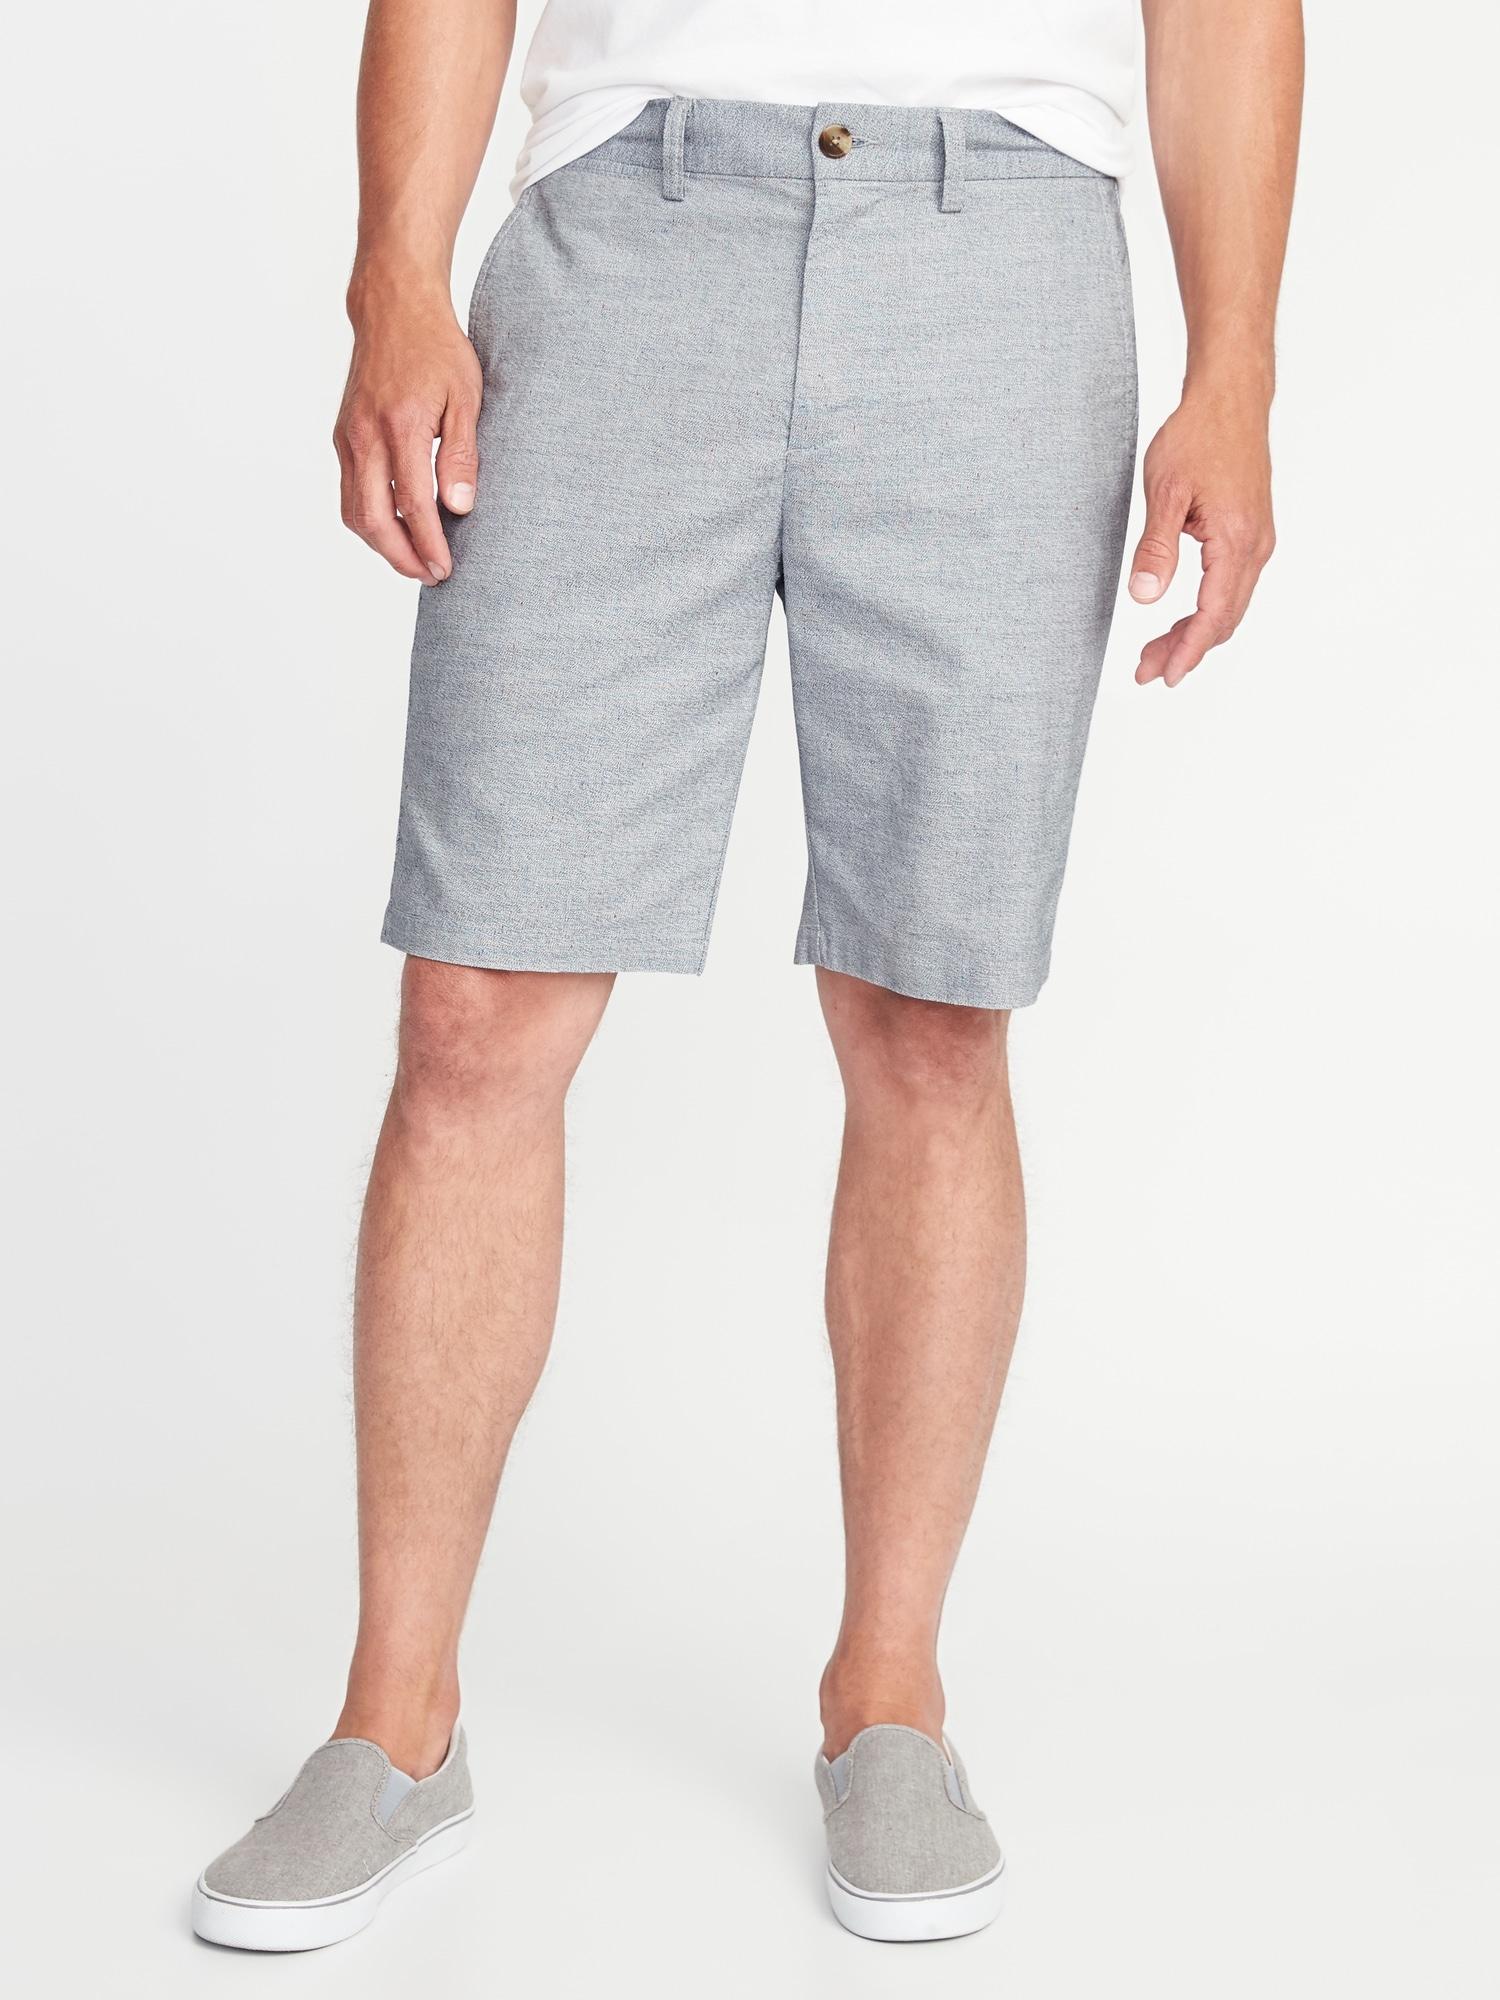 3d7711a3a2f Slim Ultimate Built-In Flex Shorts for Men - 10-inch inseam